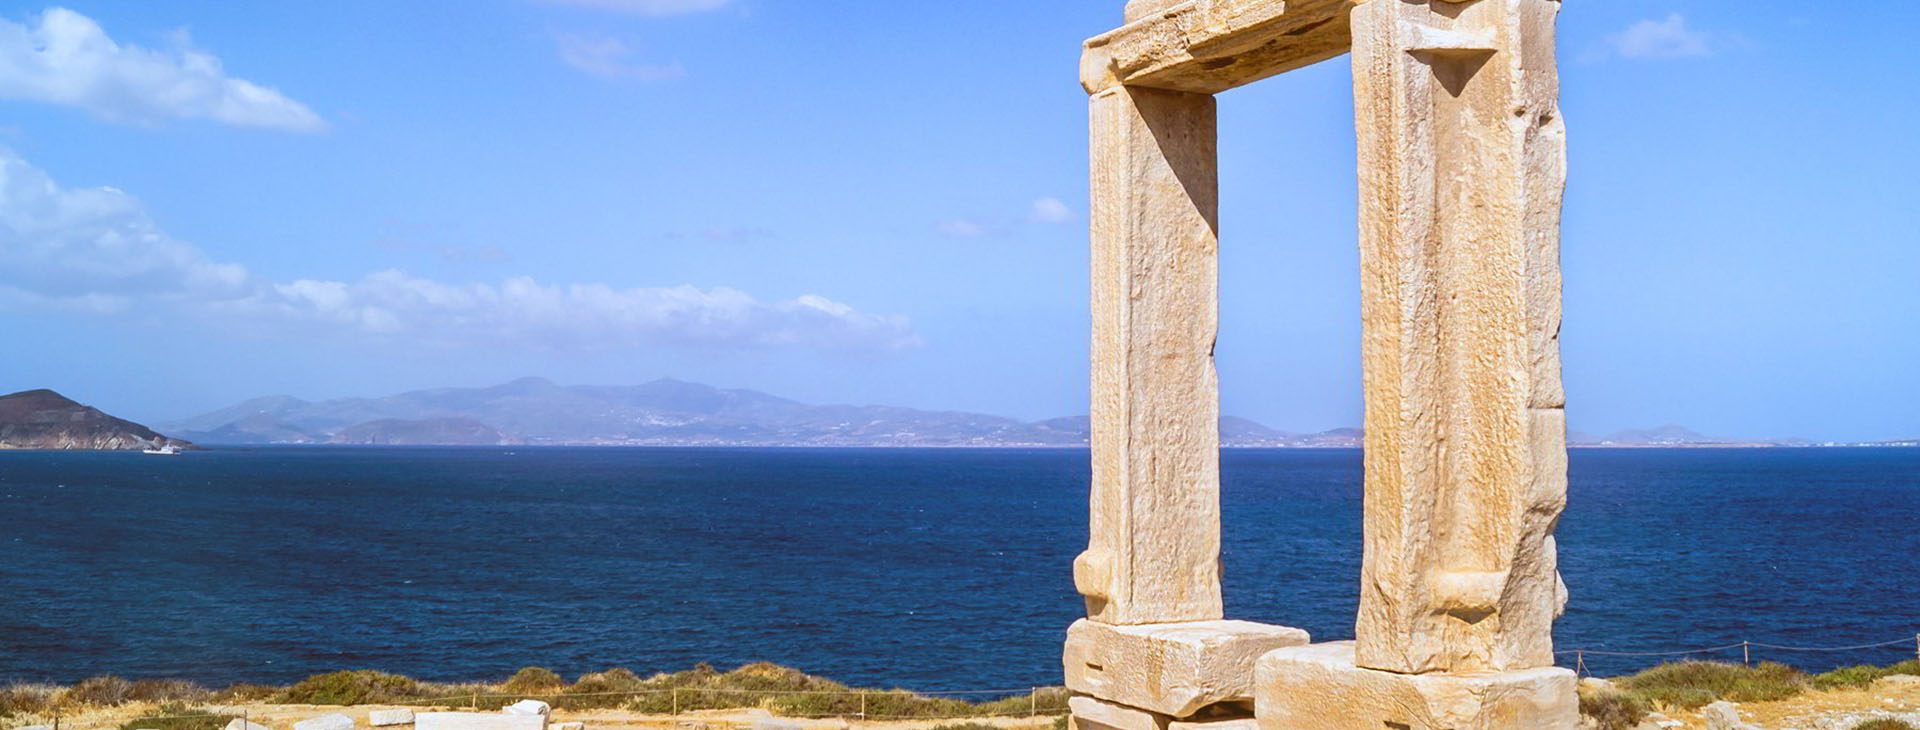 "Portara (""Gate"") at Naxos island"